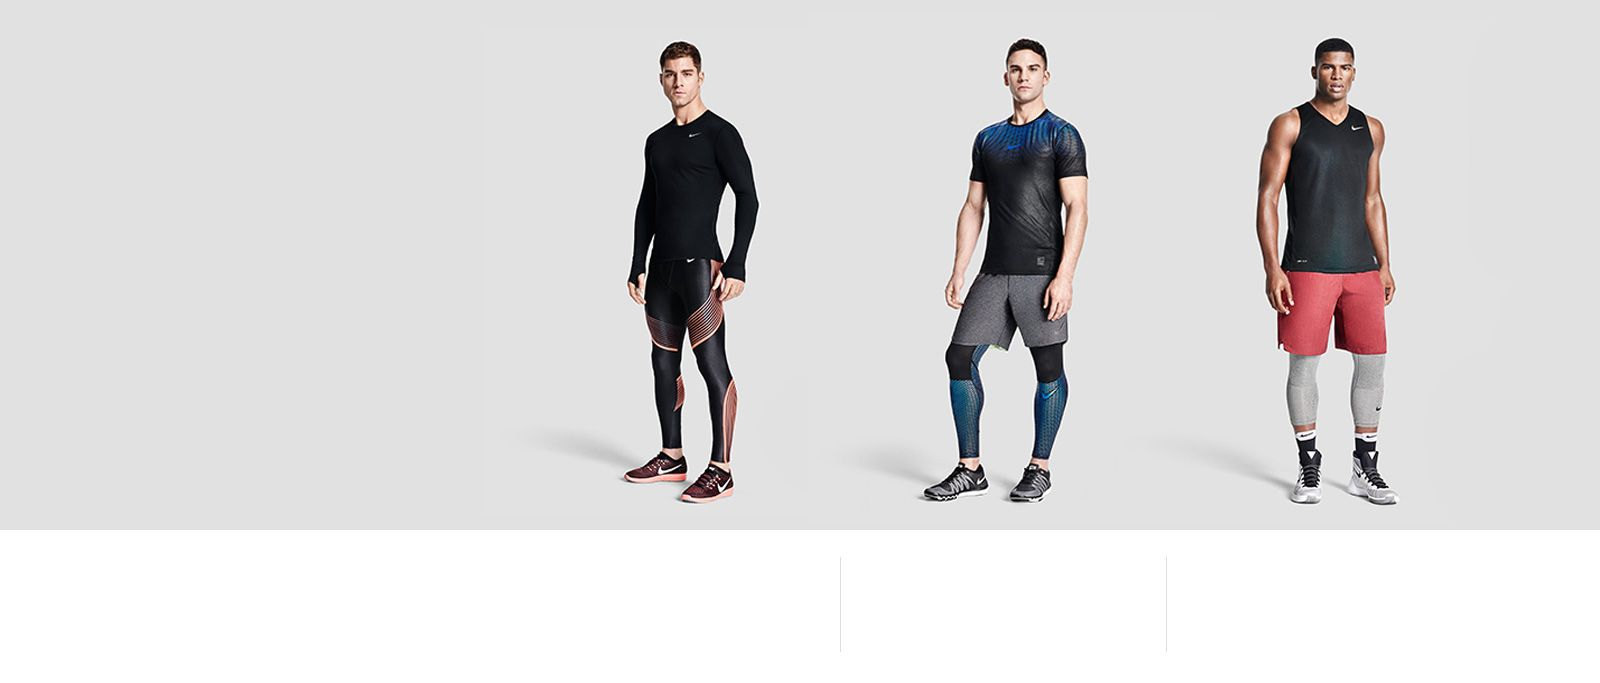 tenue de sport homme fitness chapka doudoune pull. Black Bedroom Furniture Sets. Home Design Ideas